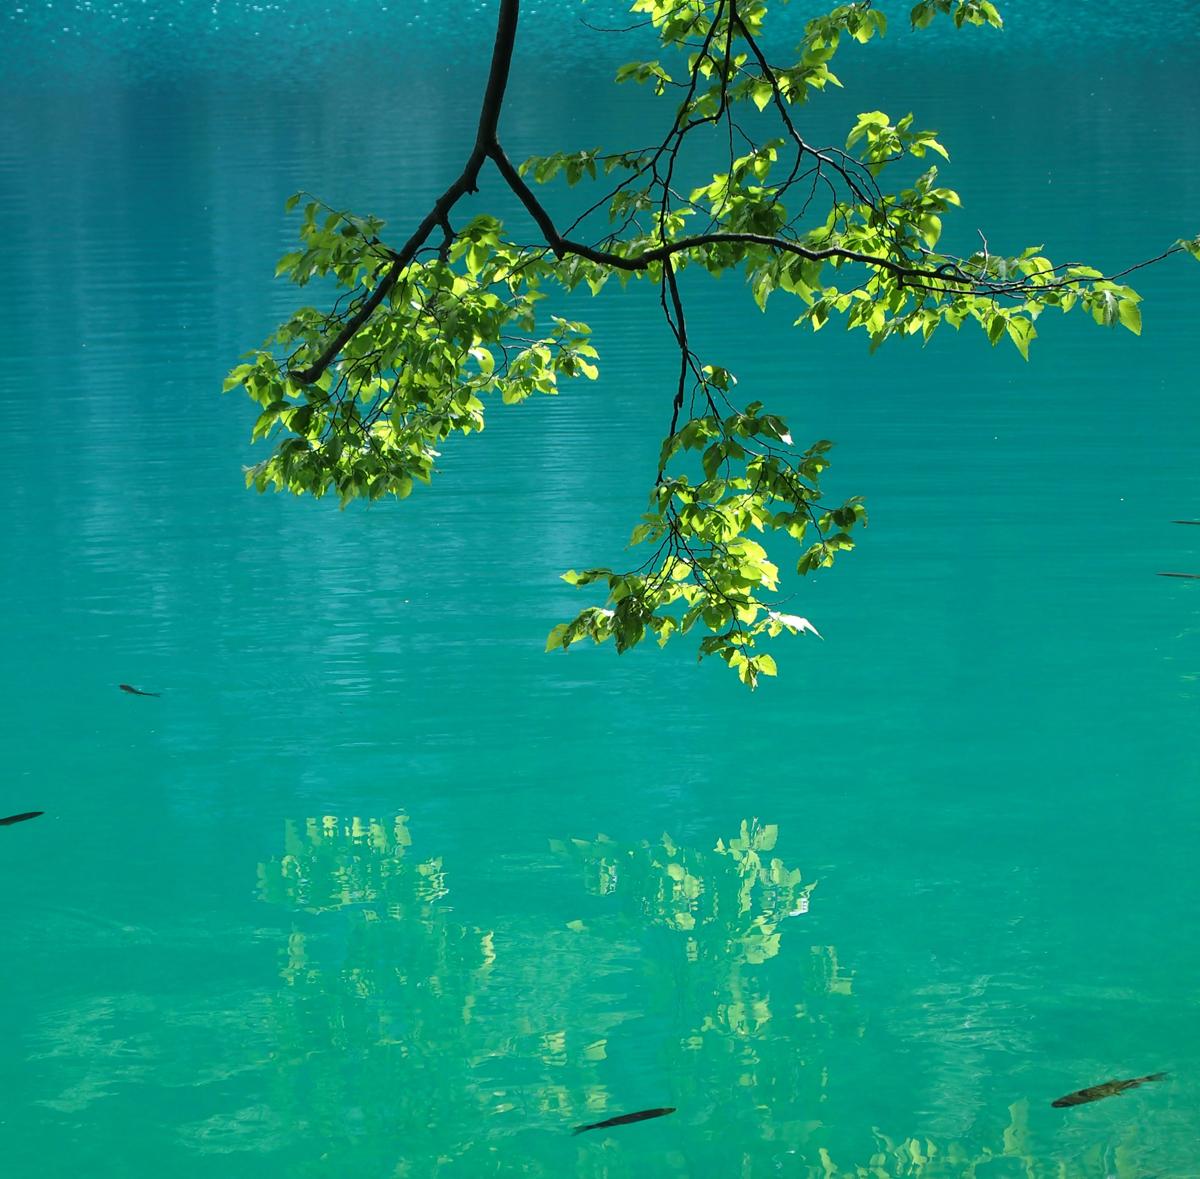 plitvice-jezera-lacs (5)